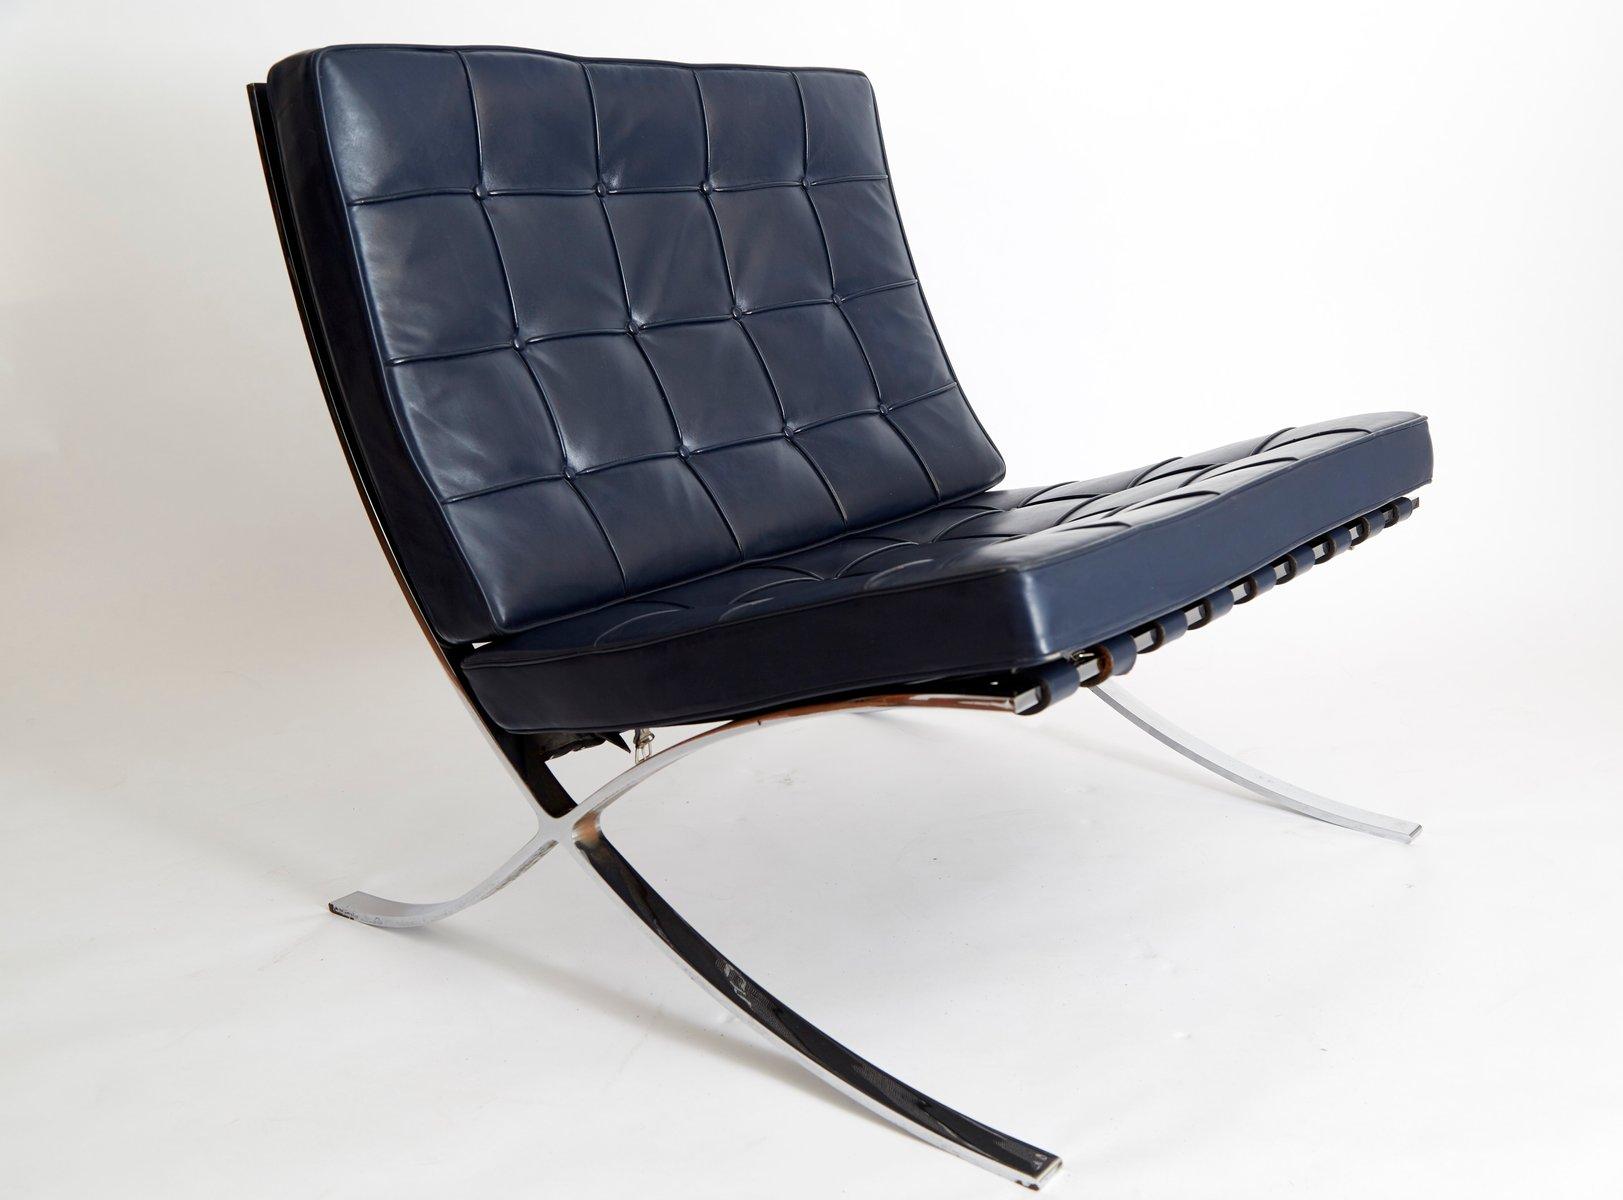 Sedia barcelona mr90 vintage di ludwig mies van der rohe - Mies van der rohe sedia ...